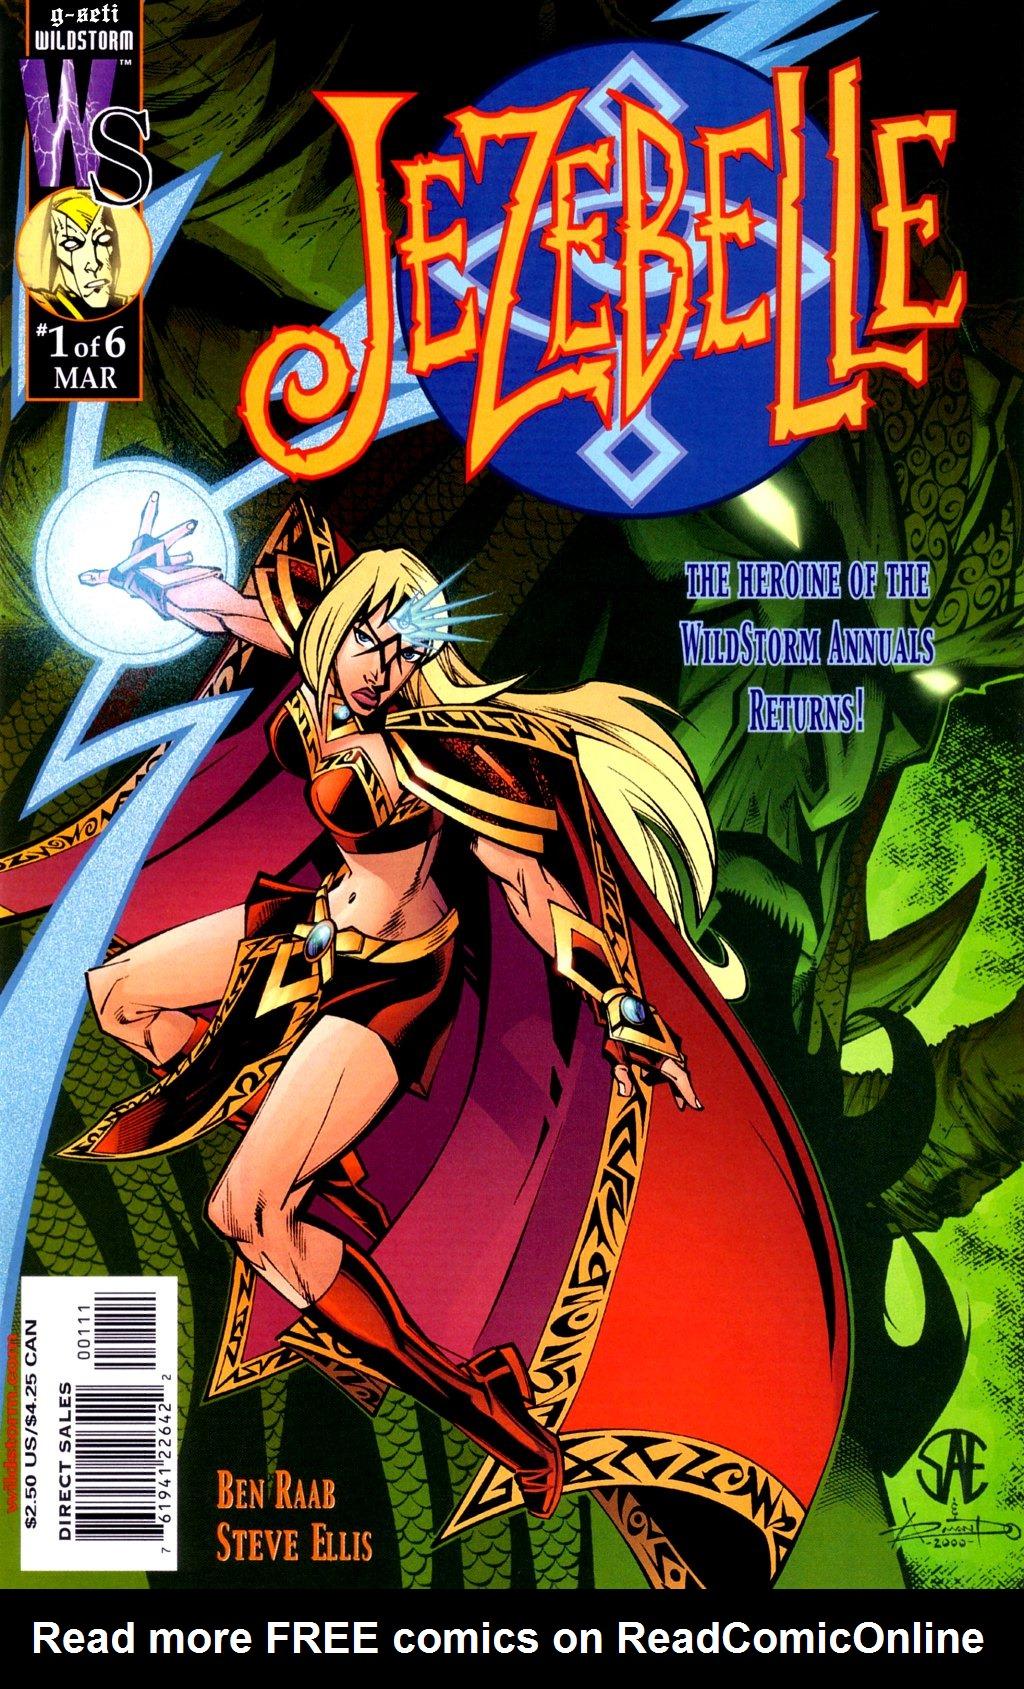 Read online Jezebelle comic -  Issue #1 - 1